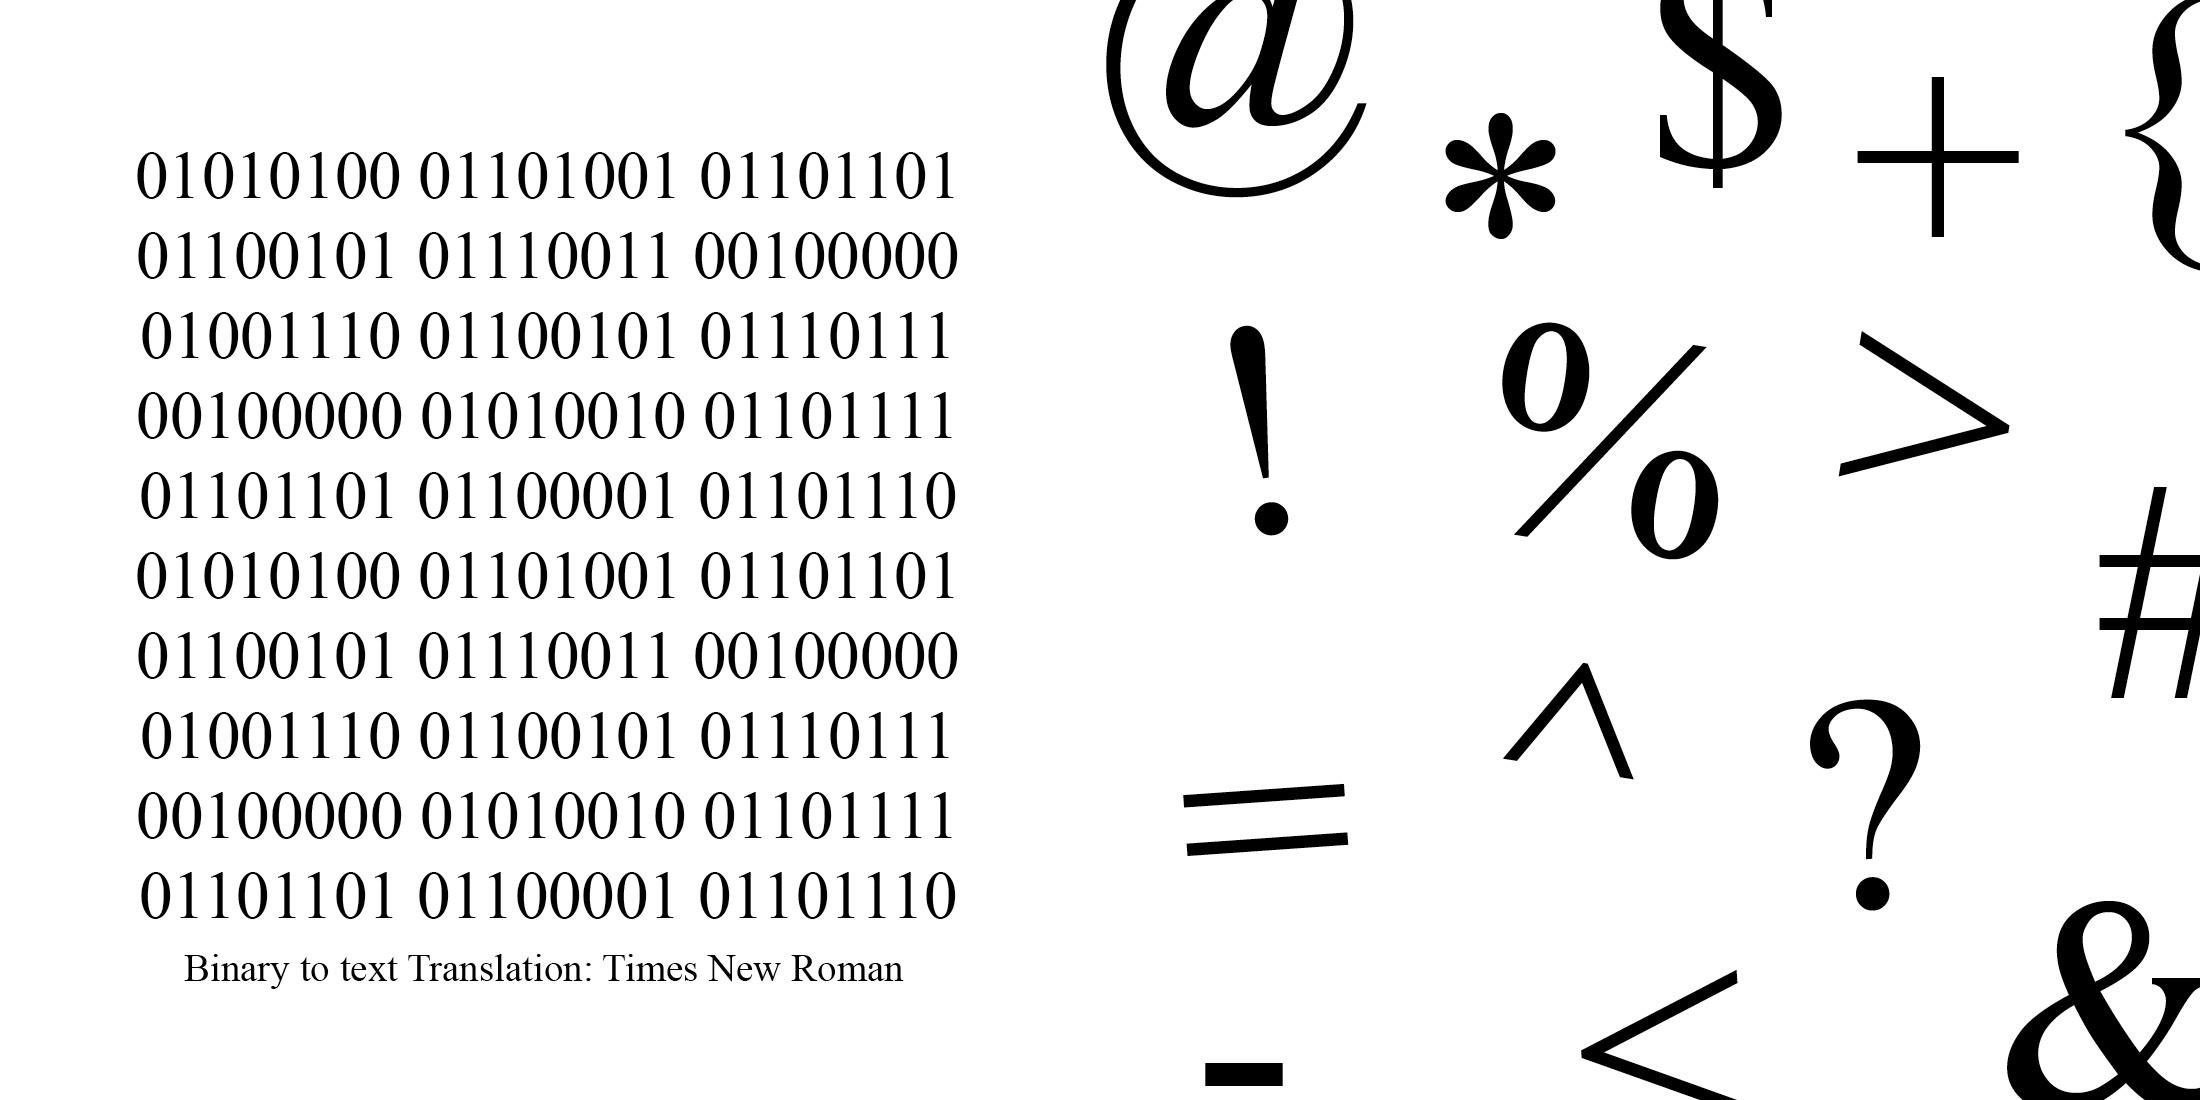 Alex Daniels Typeography7